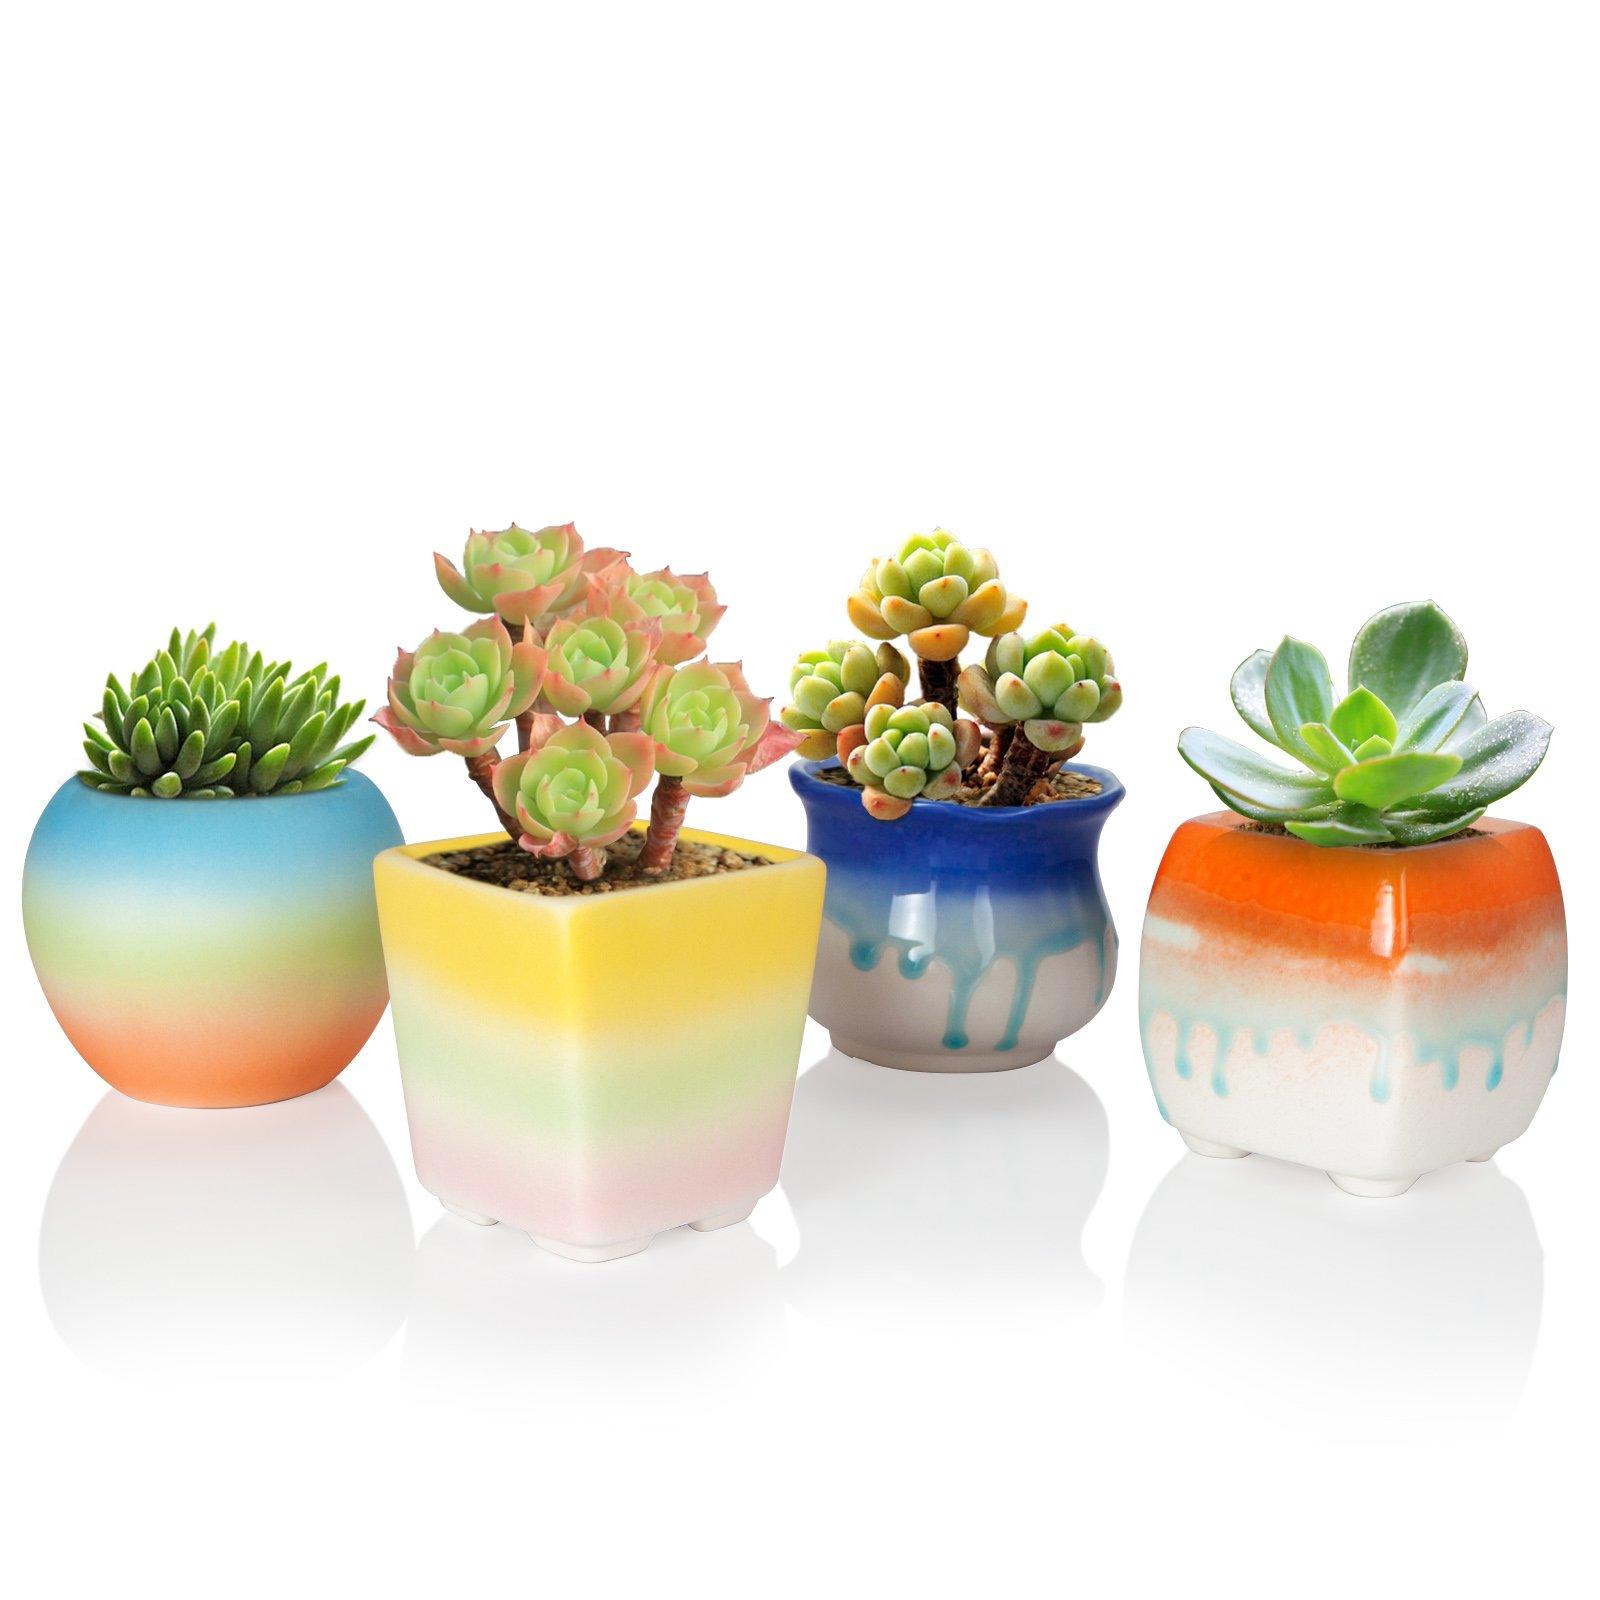 Solofish Succulent Plant Pot, Set of 4 Cute Rainbow Ceramic Pot Cactus Plant Pot Colorful Indoor Outdoor Garden Balcony Bucket Container Planter (Plants are Not Include) (Mini Size Pots Set) by Solofish